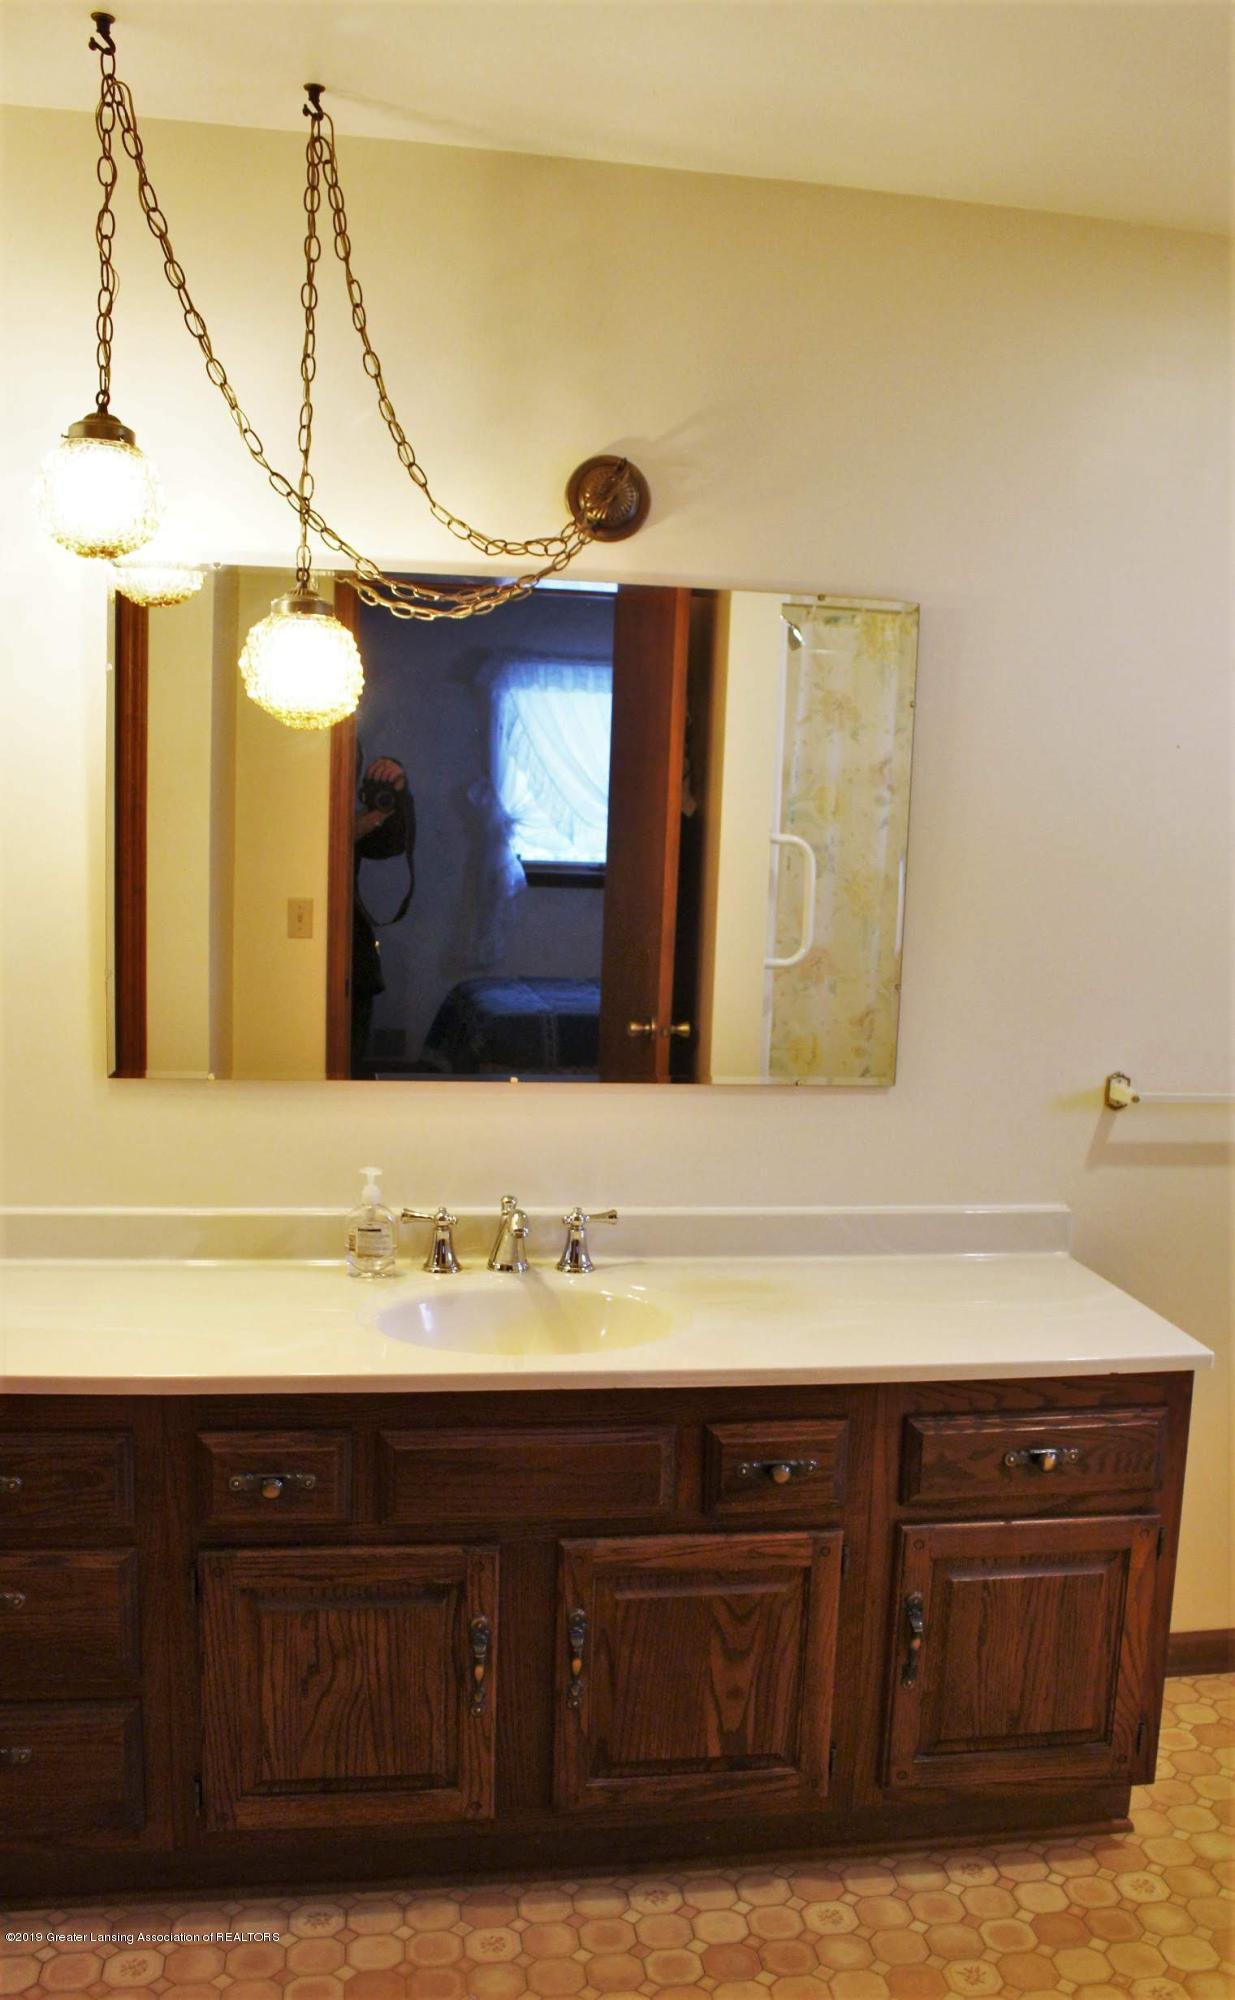 436 N Maple St - Bathroom - 17